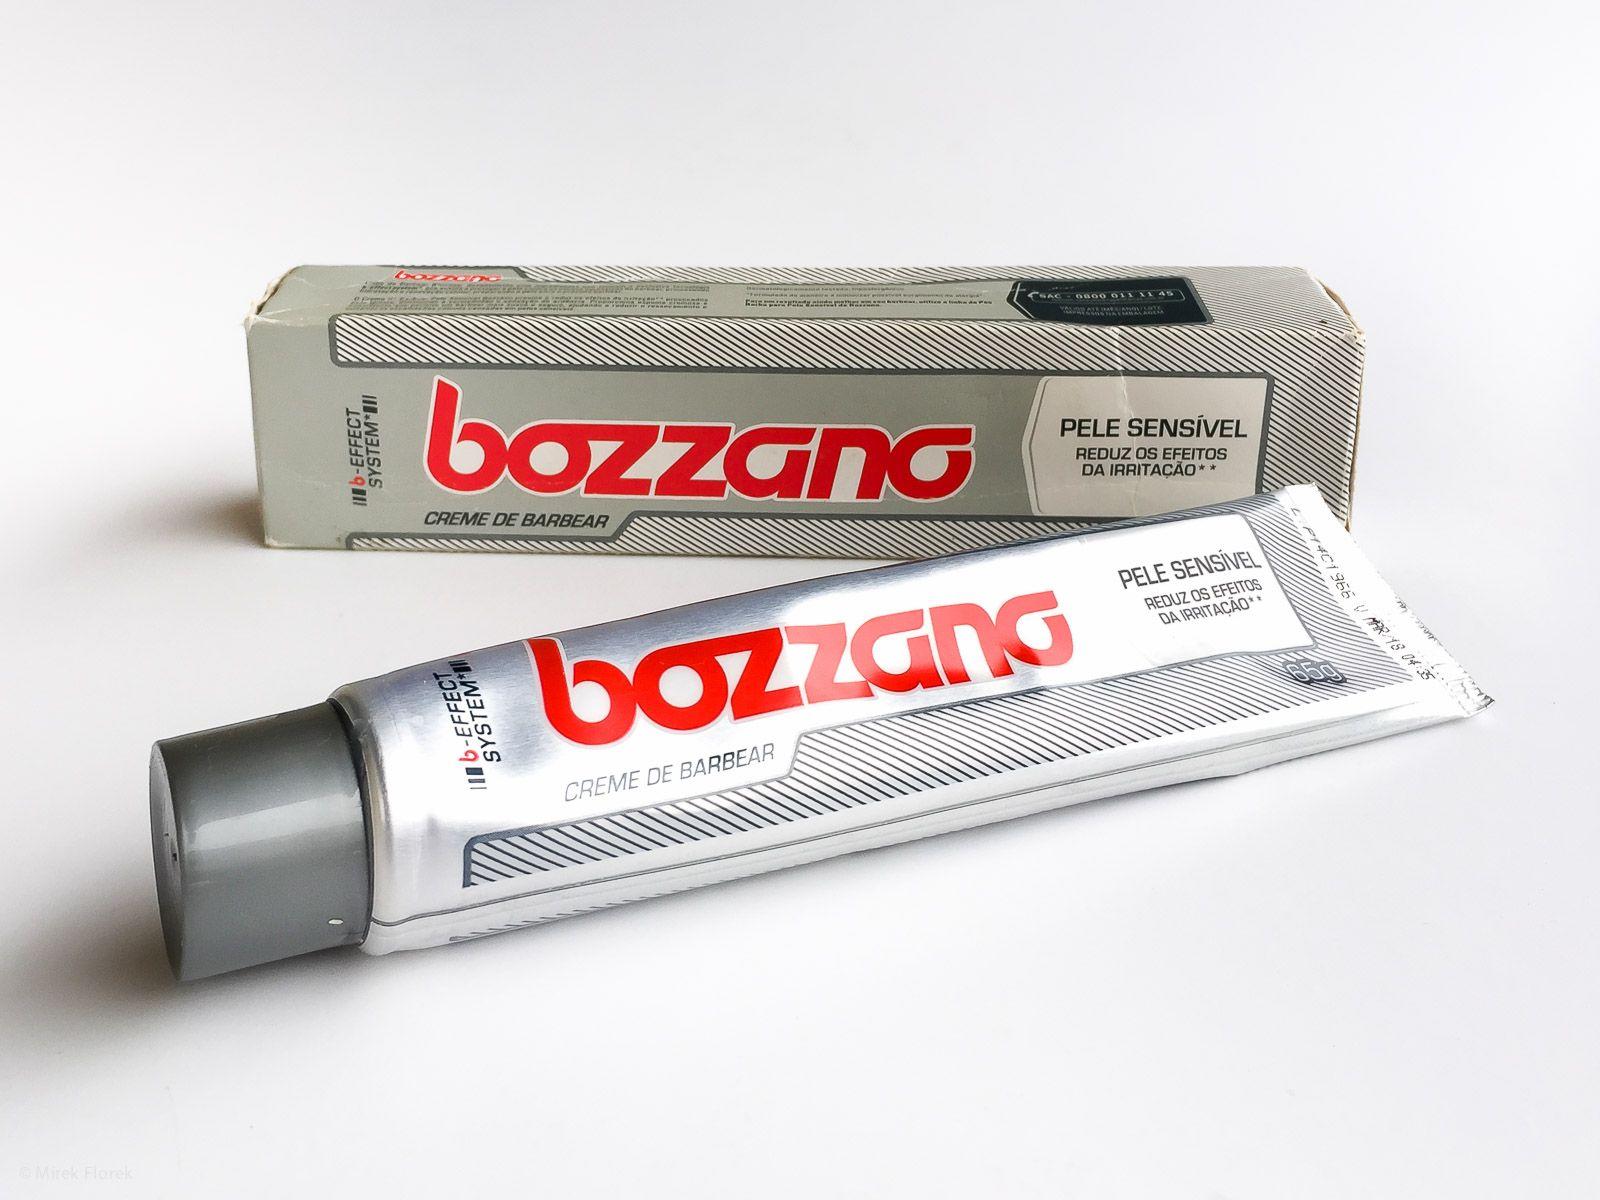 Opakowanie kremu do golenia Bozzano Creme de Barbear Pele Sensivel